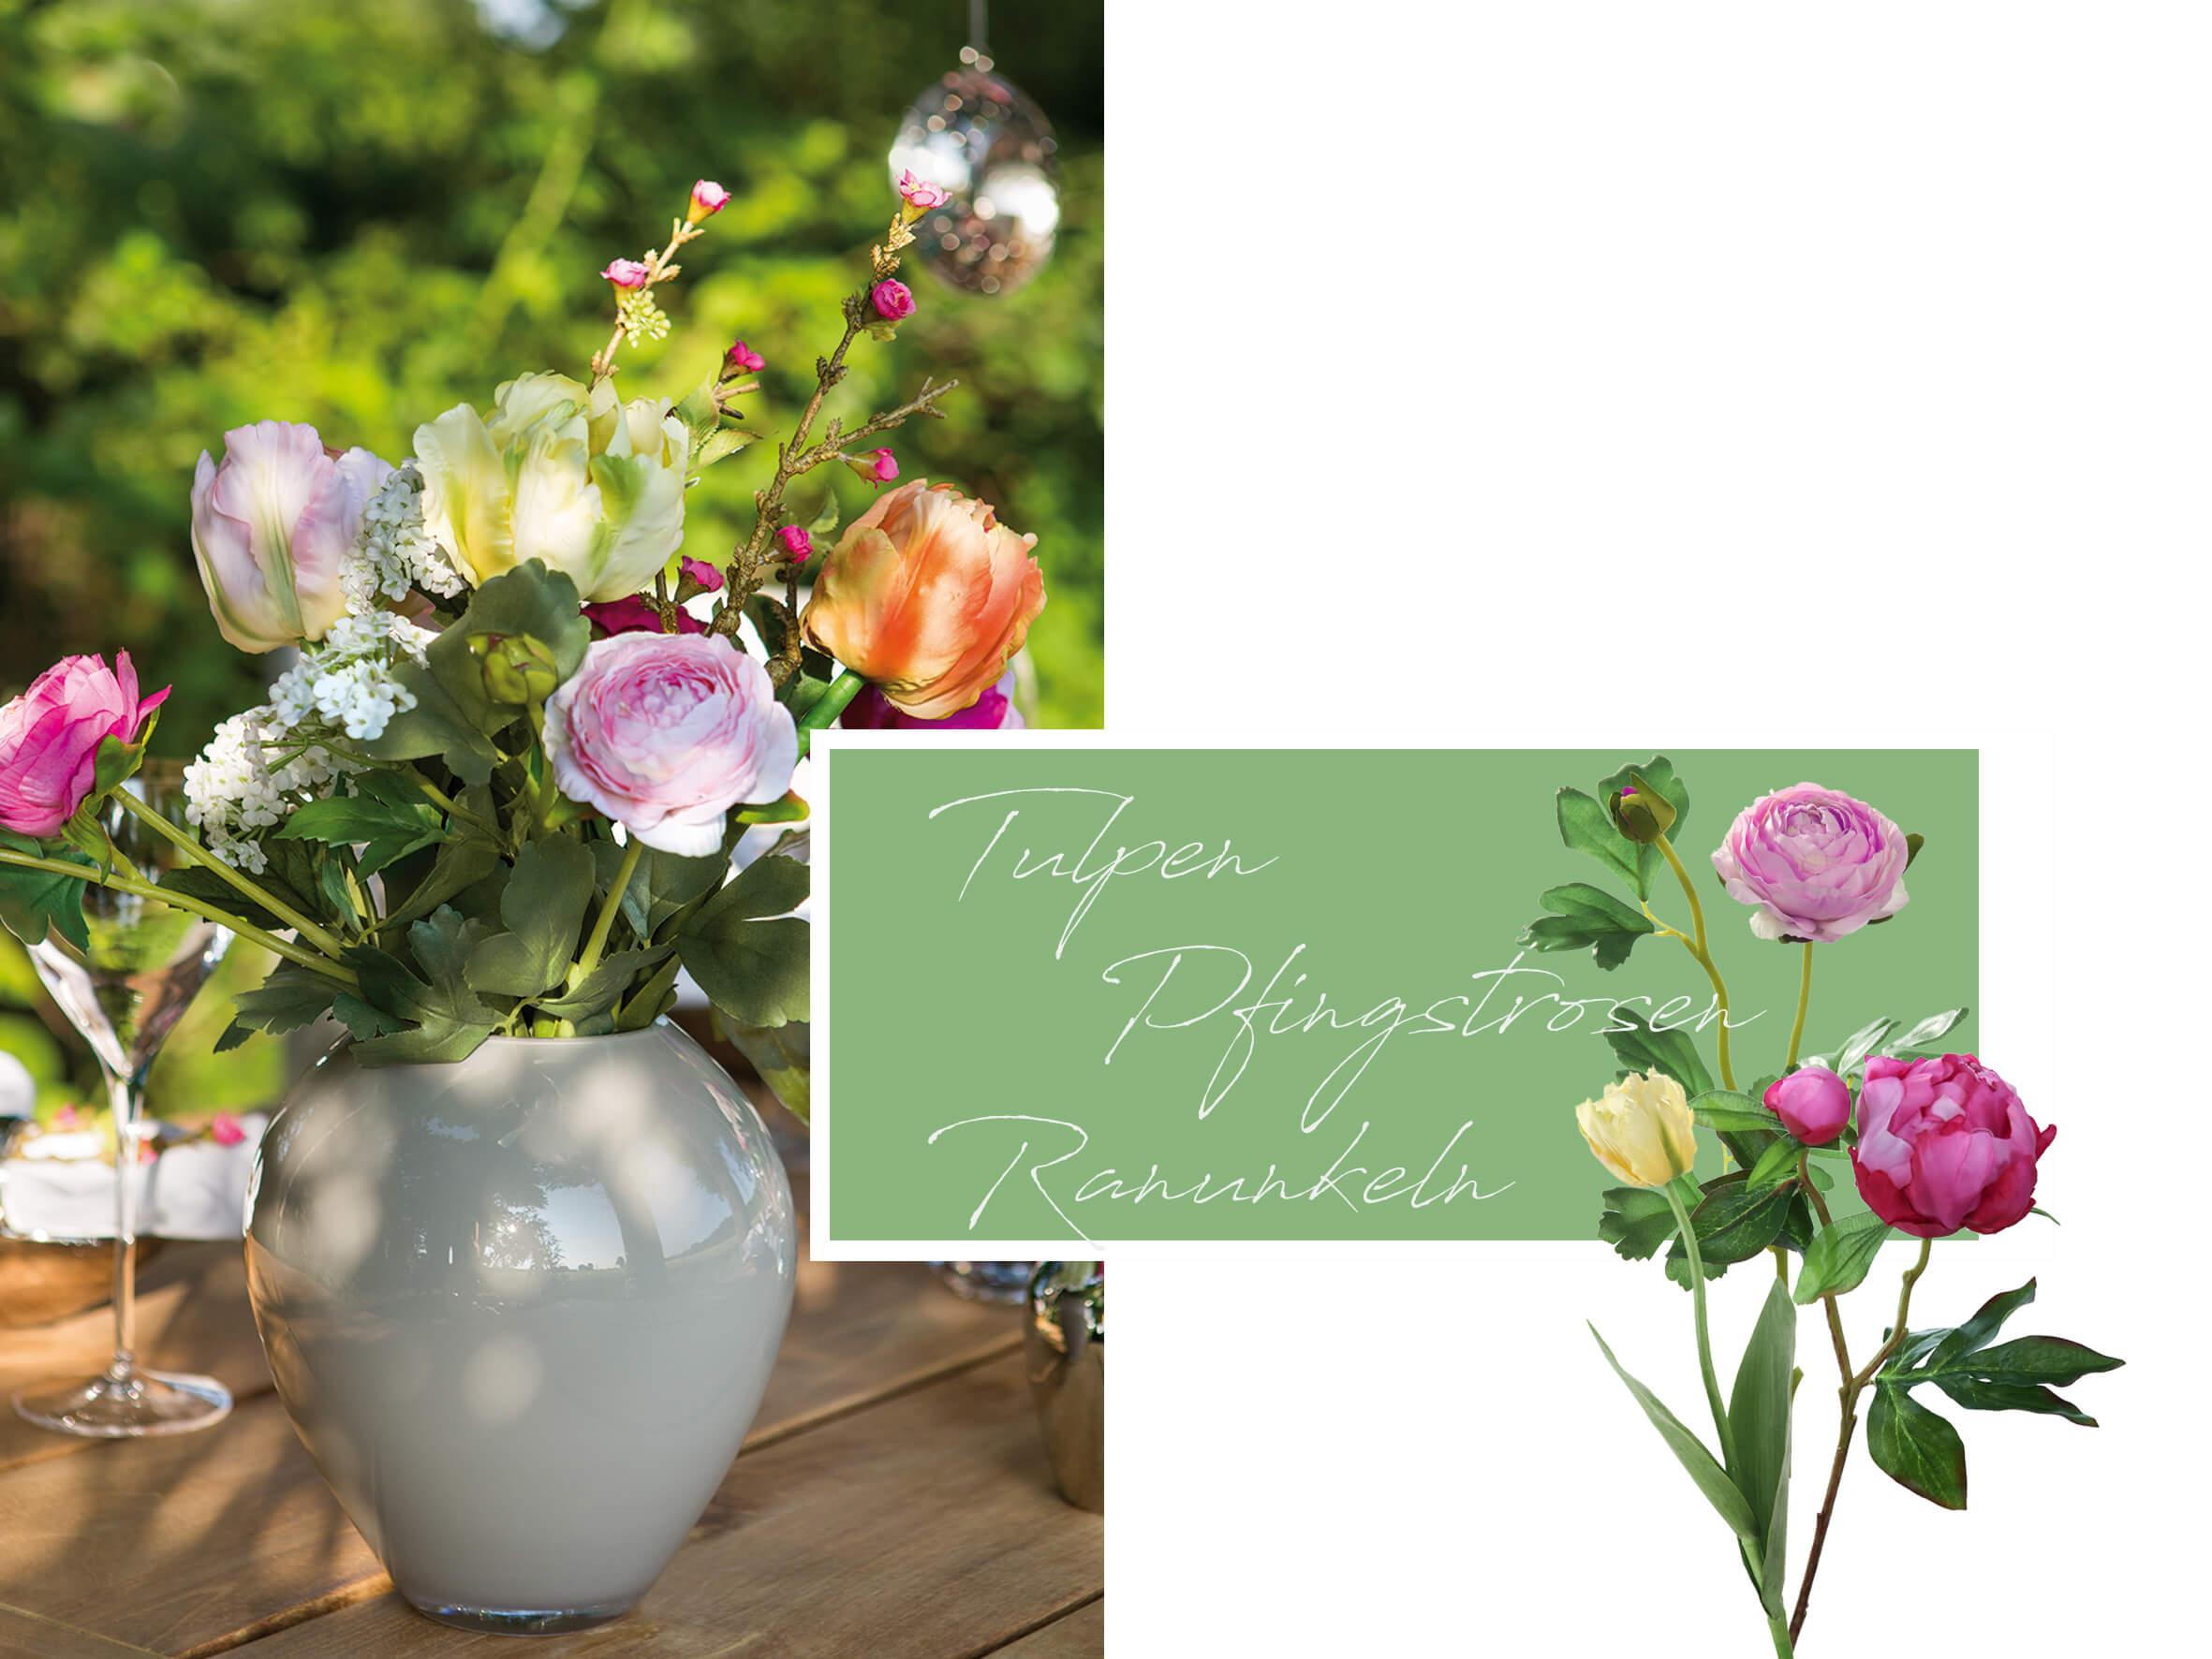 Blumendekoration mit Tulpen, Pfingstrosen und Ranunkeln.